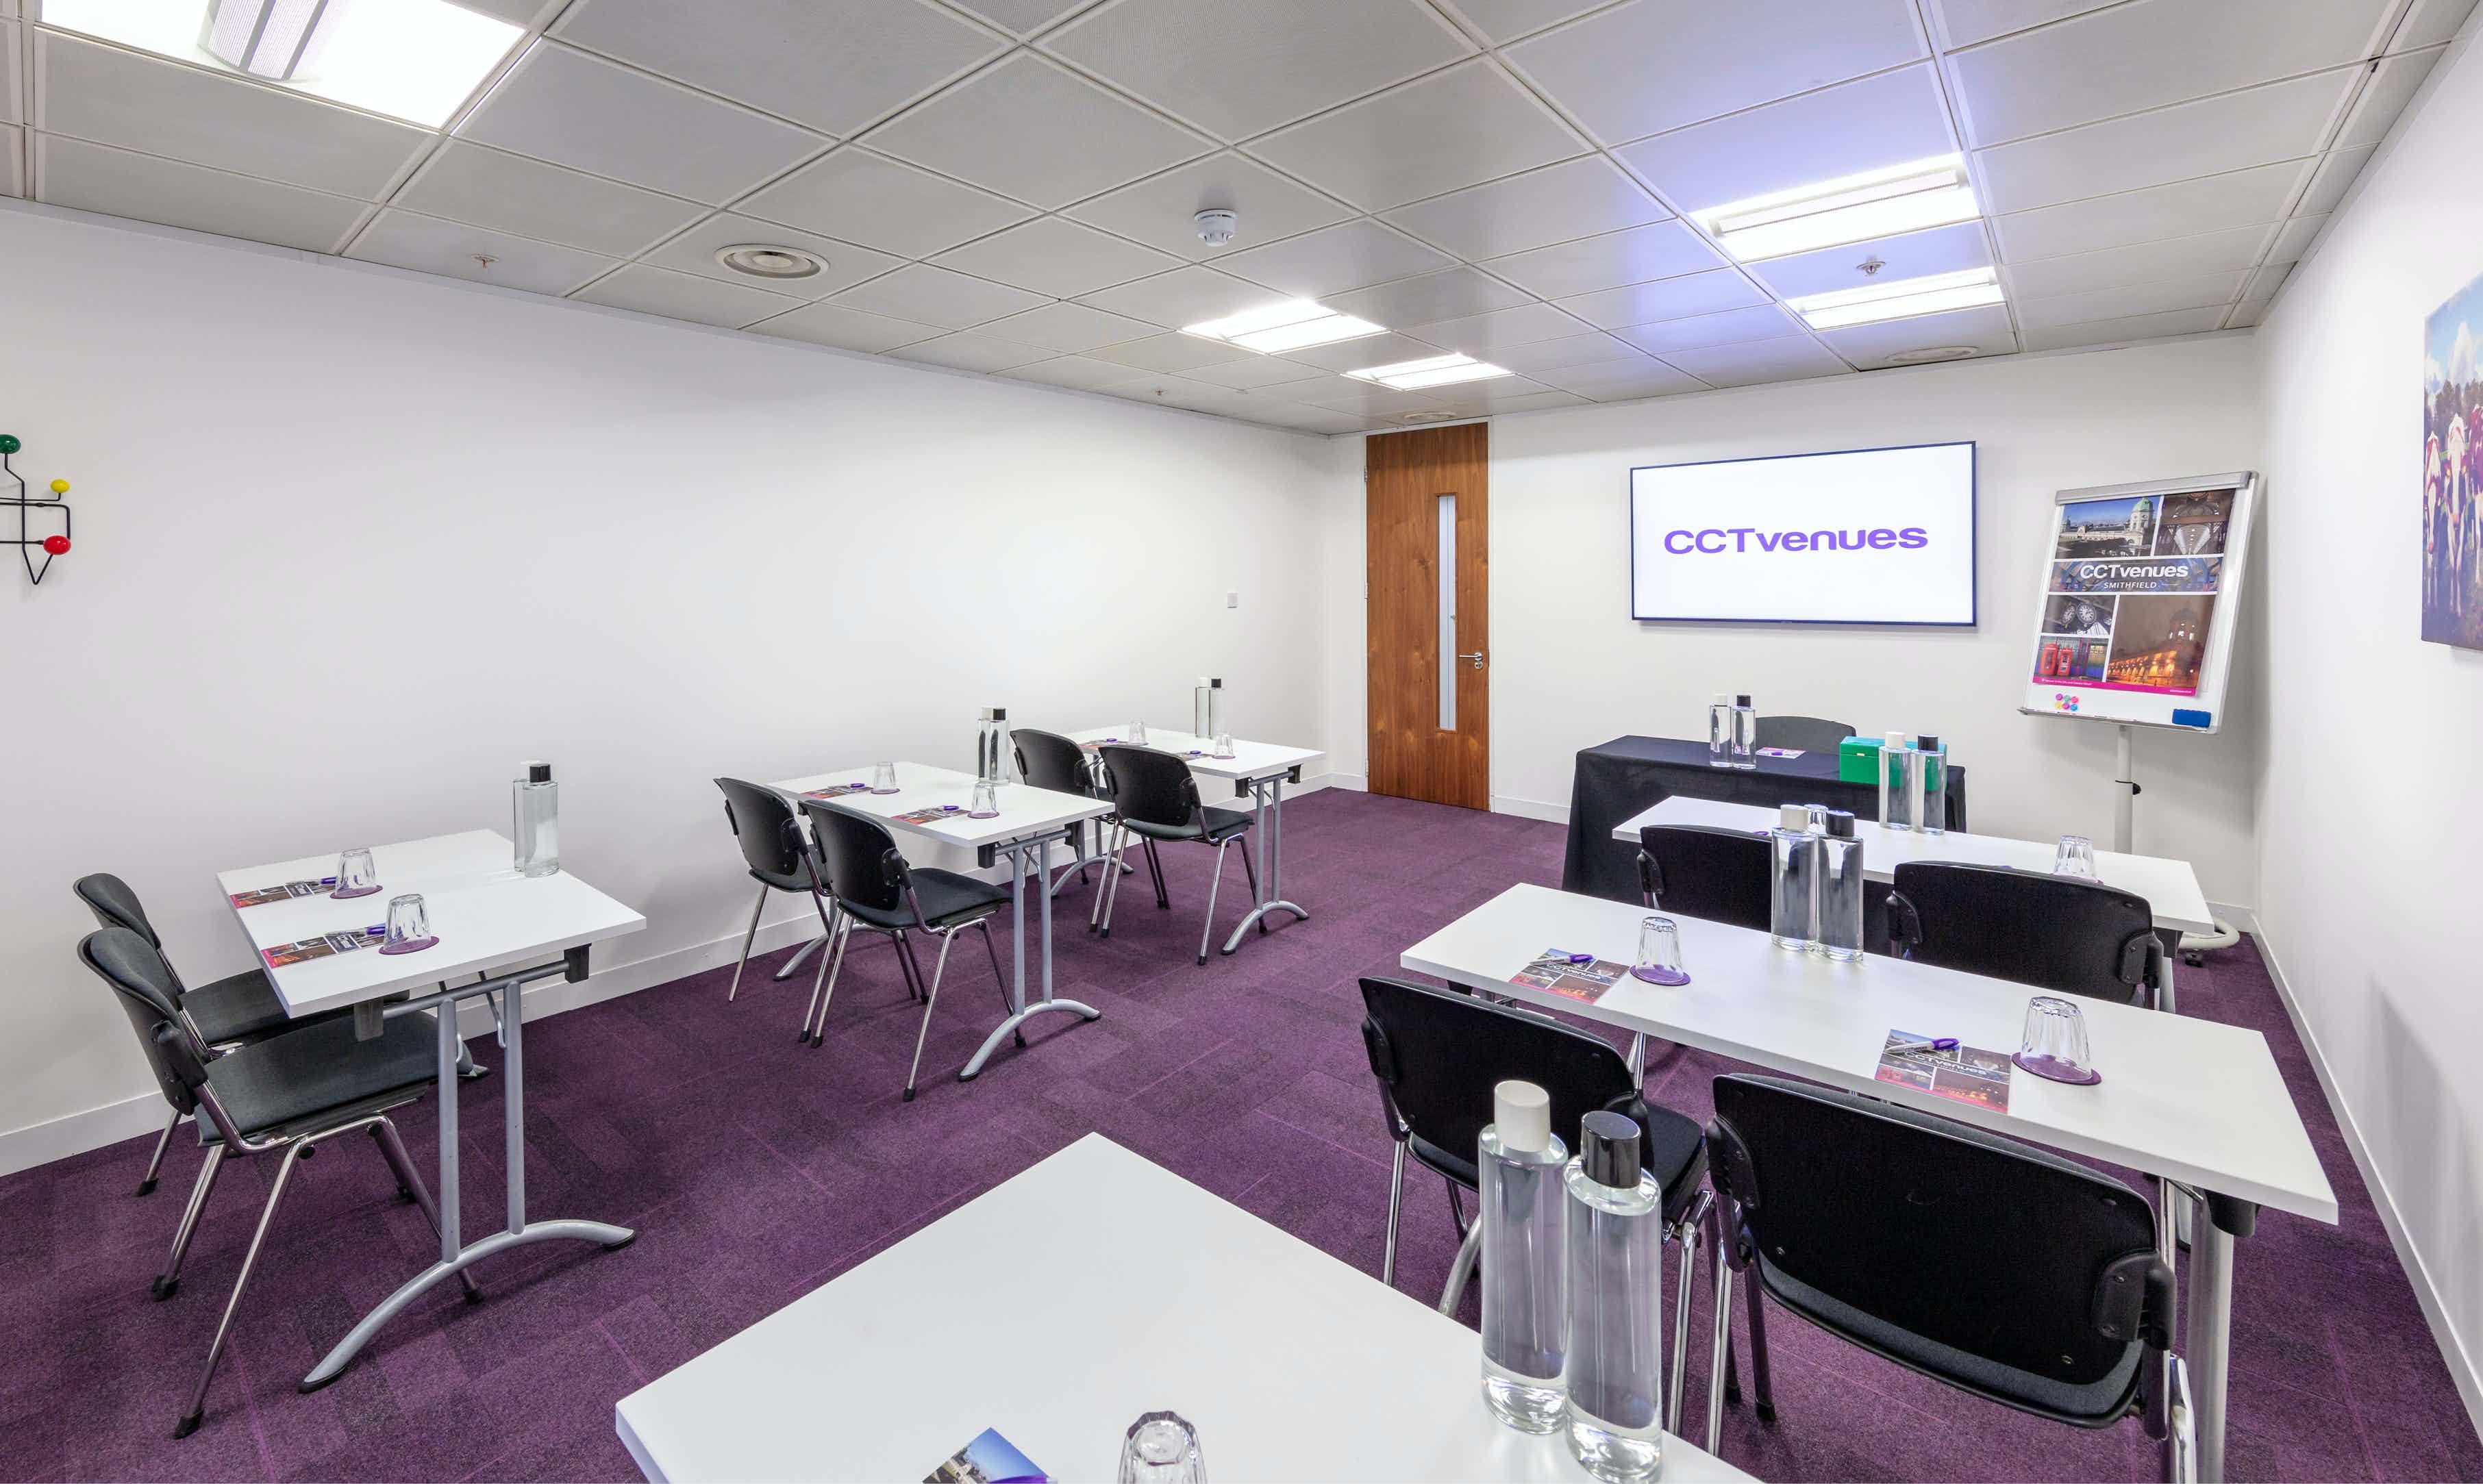 Meeting Room 4, CCT Venues, Smithfield